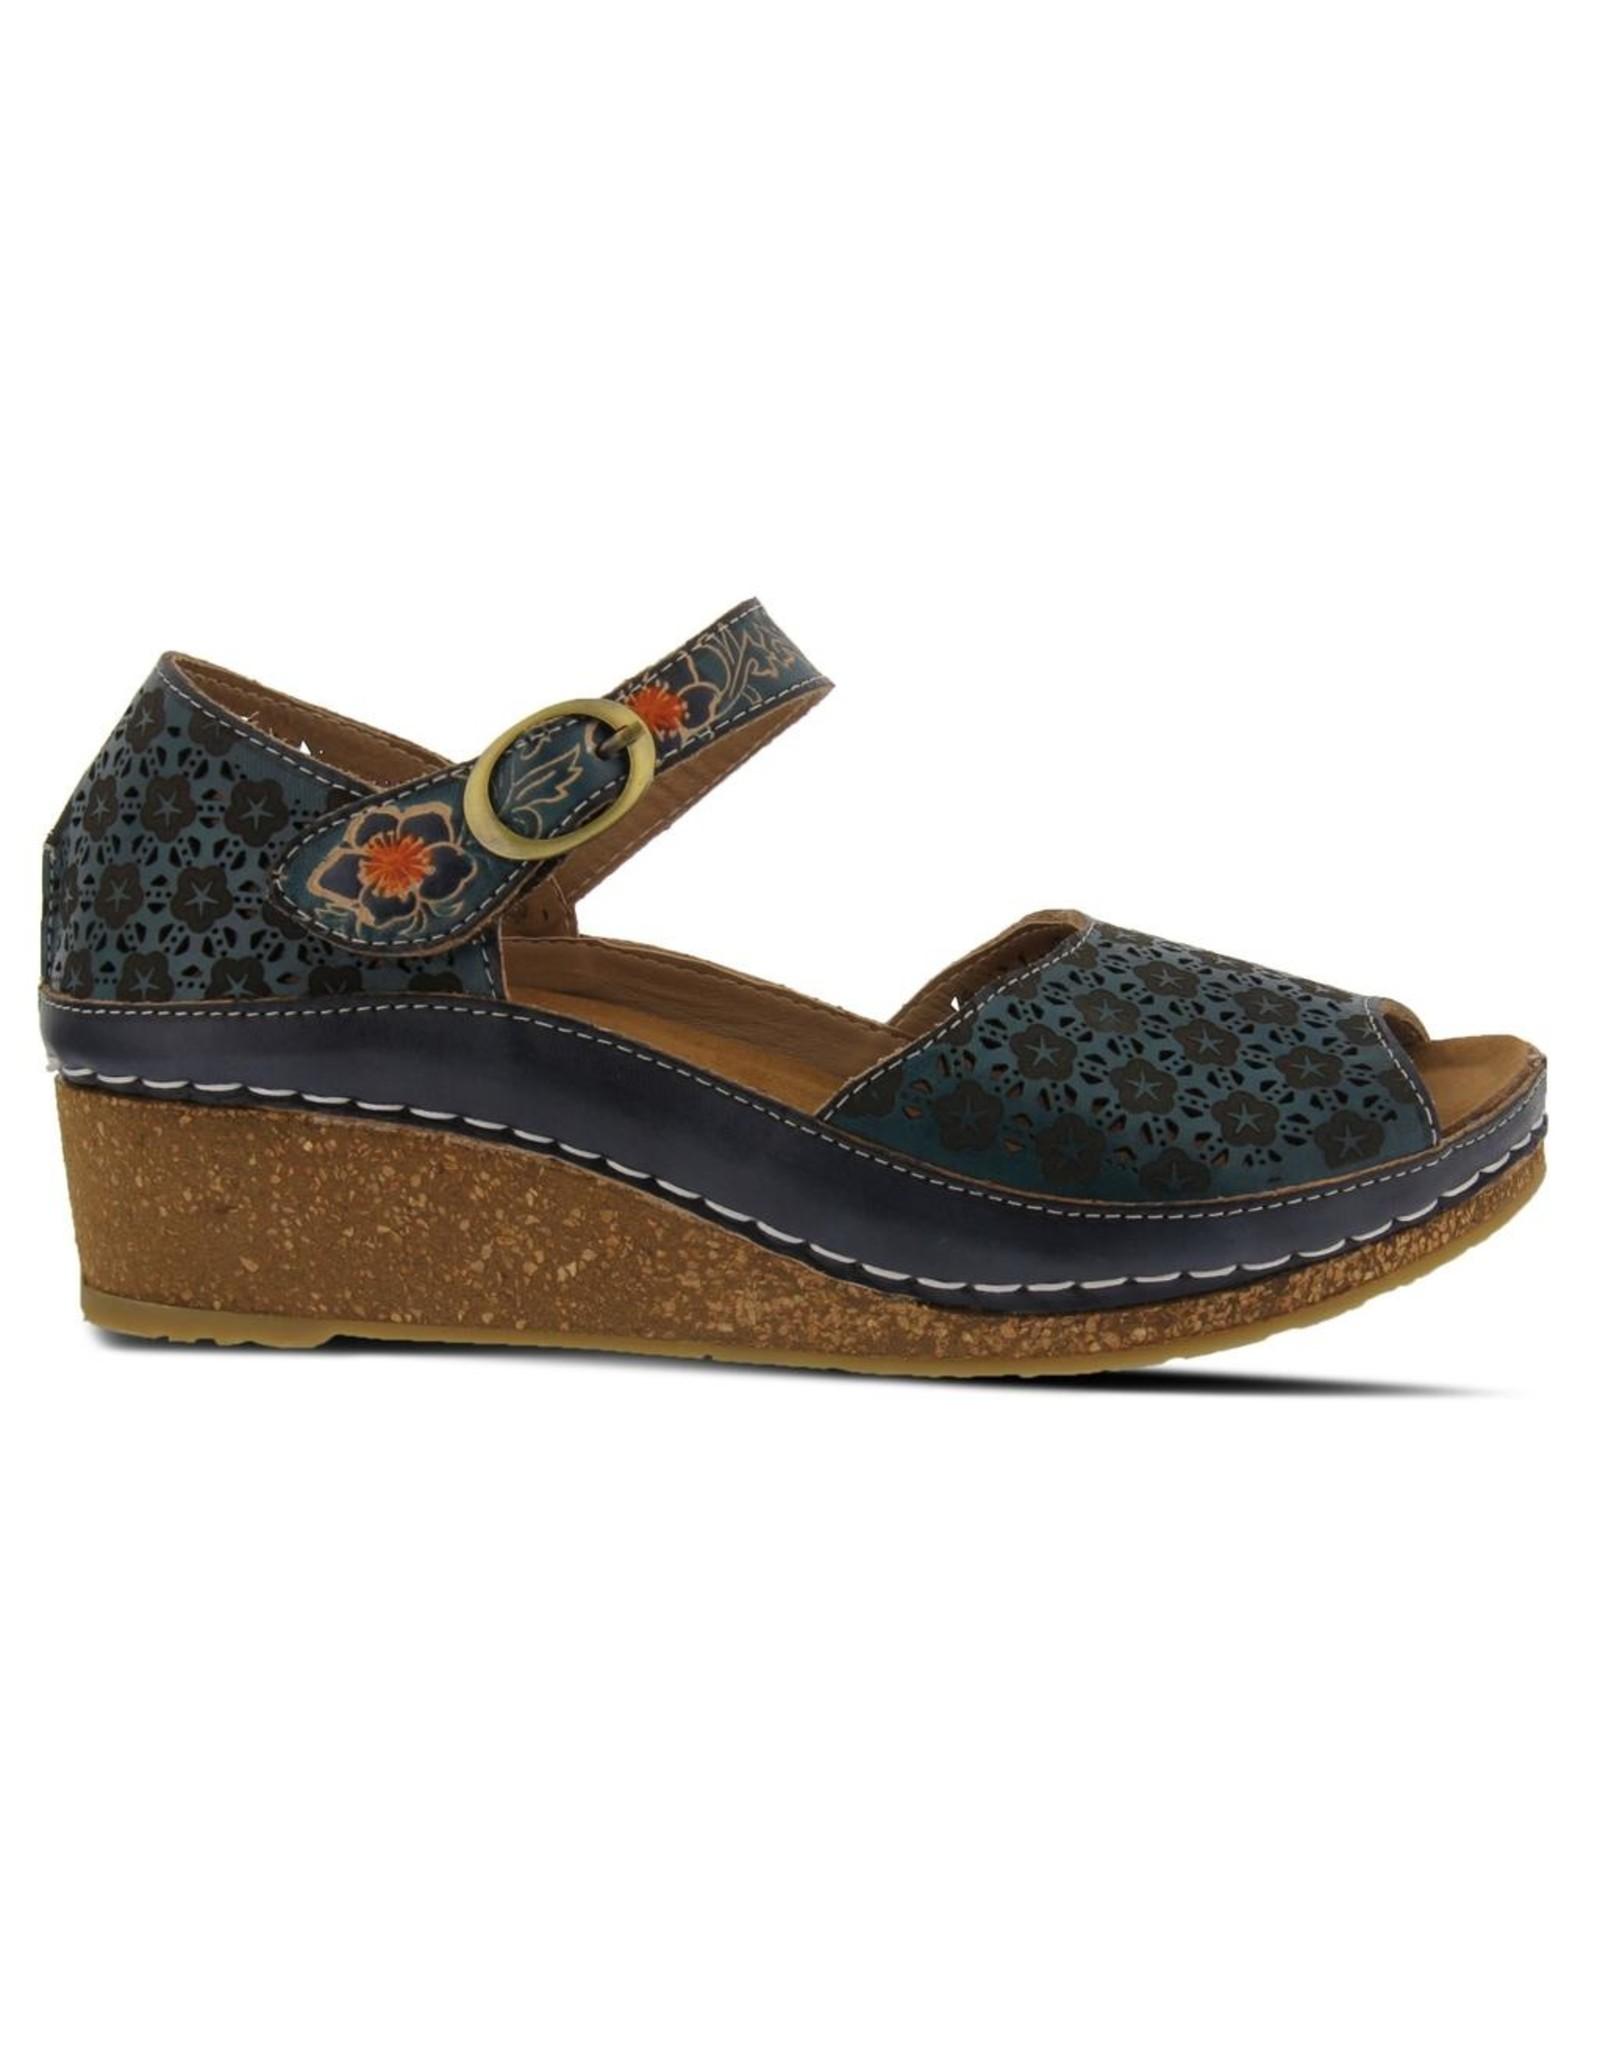 Delphia Leather Ankle Strap Sandal